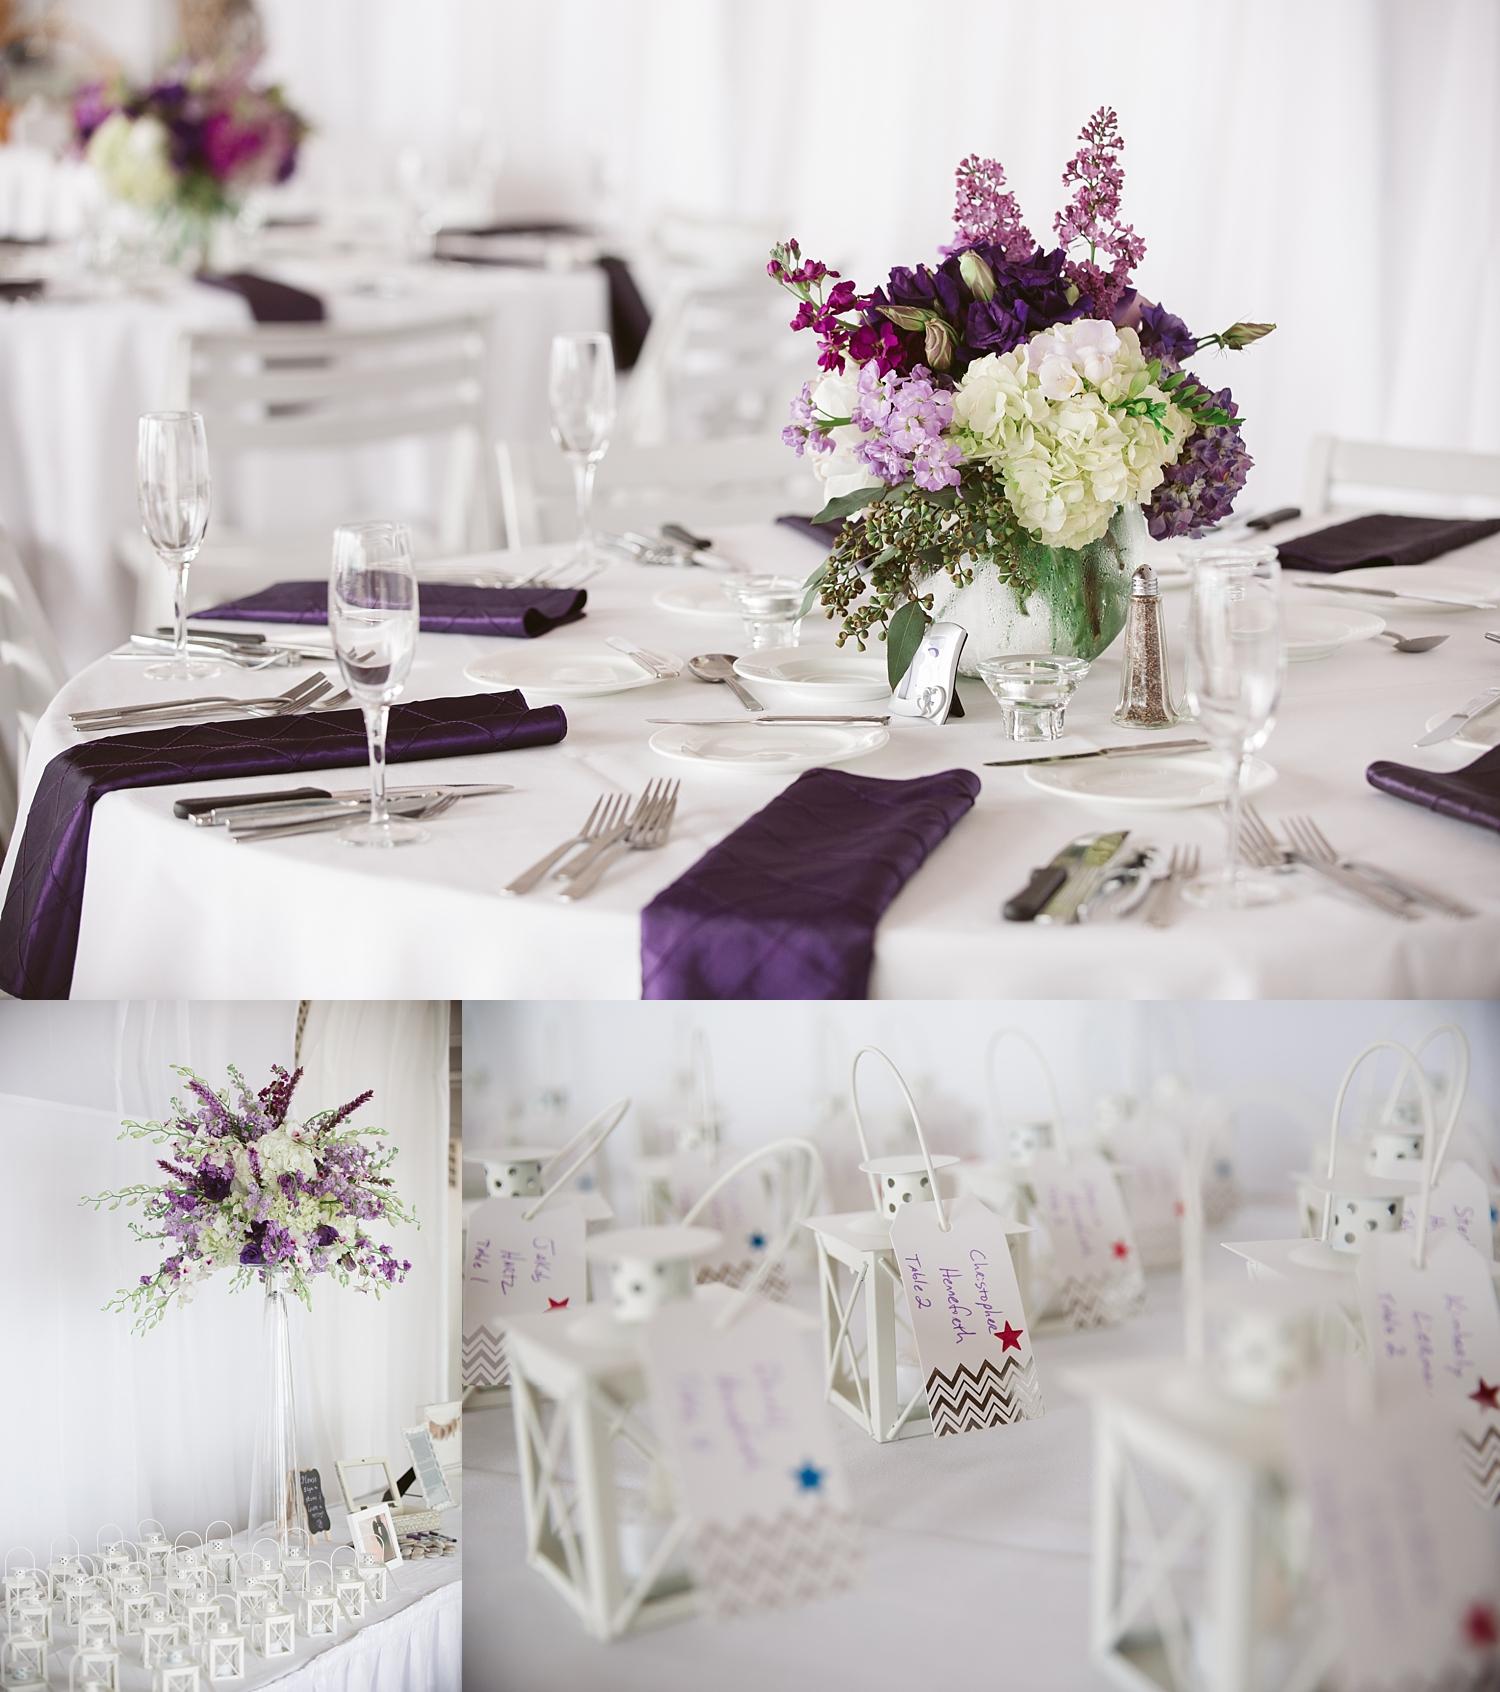 hilton_clearwater_wedding_36.jpg